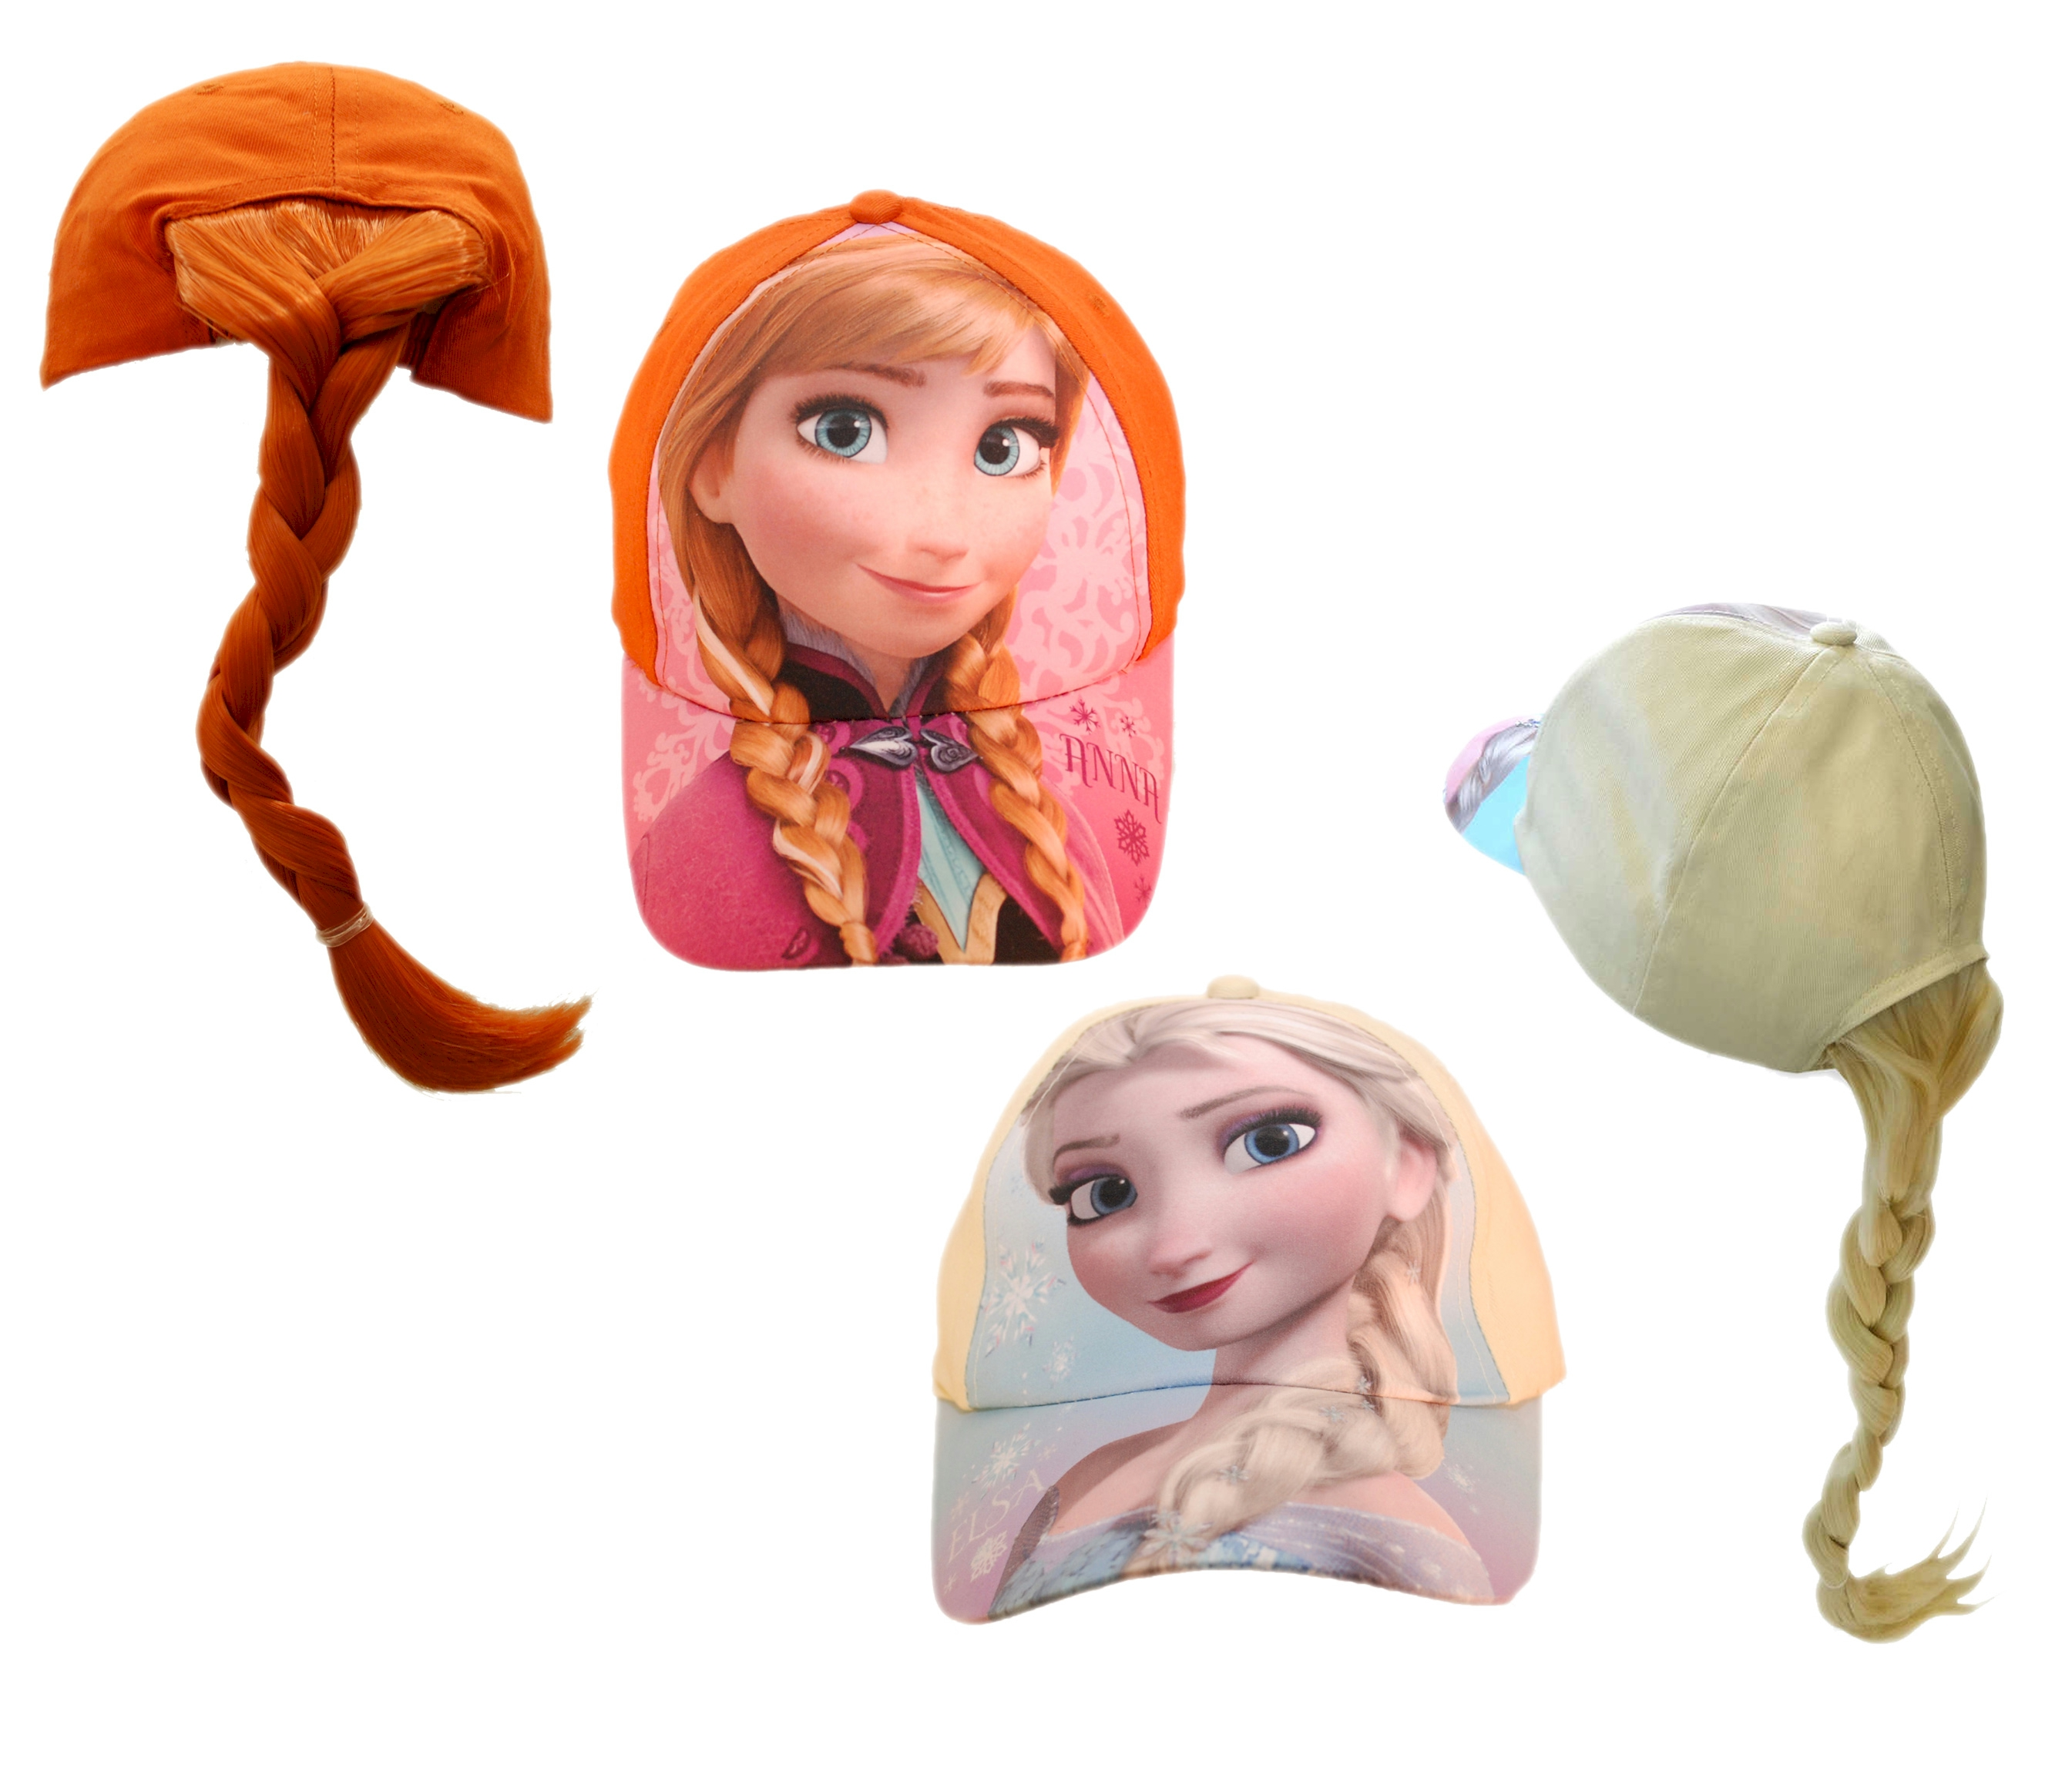 Frozen Anna   Elsa Baseball Cap with Fake Hair Ponytail - Great fun in the  sun! 5eaec3c38d4